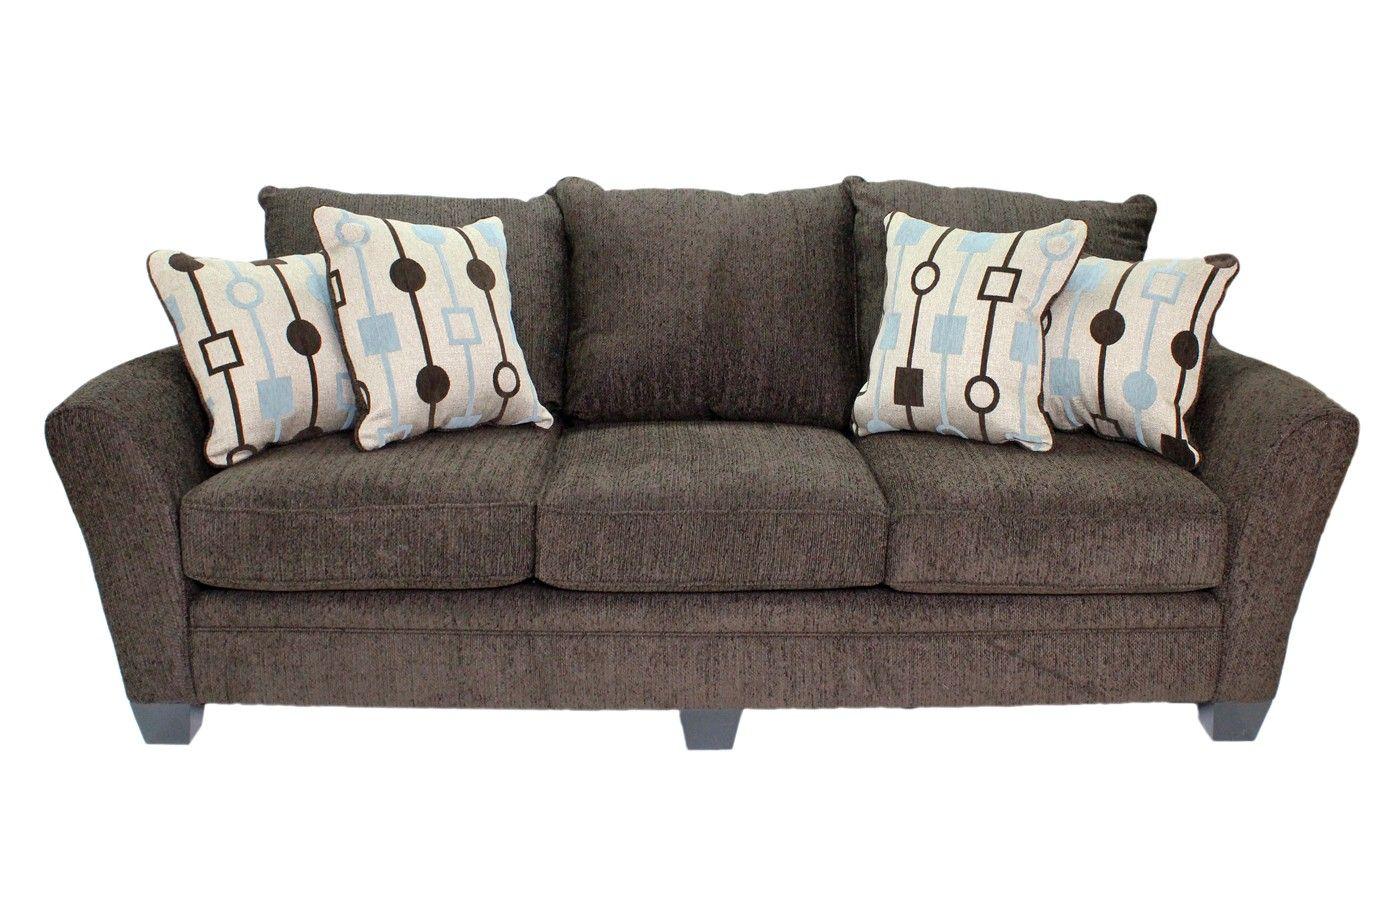 Brazil Sofa Sofa Couch Furniture Living Room Sofa Set